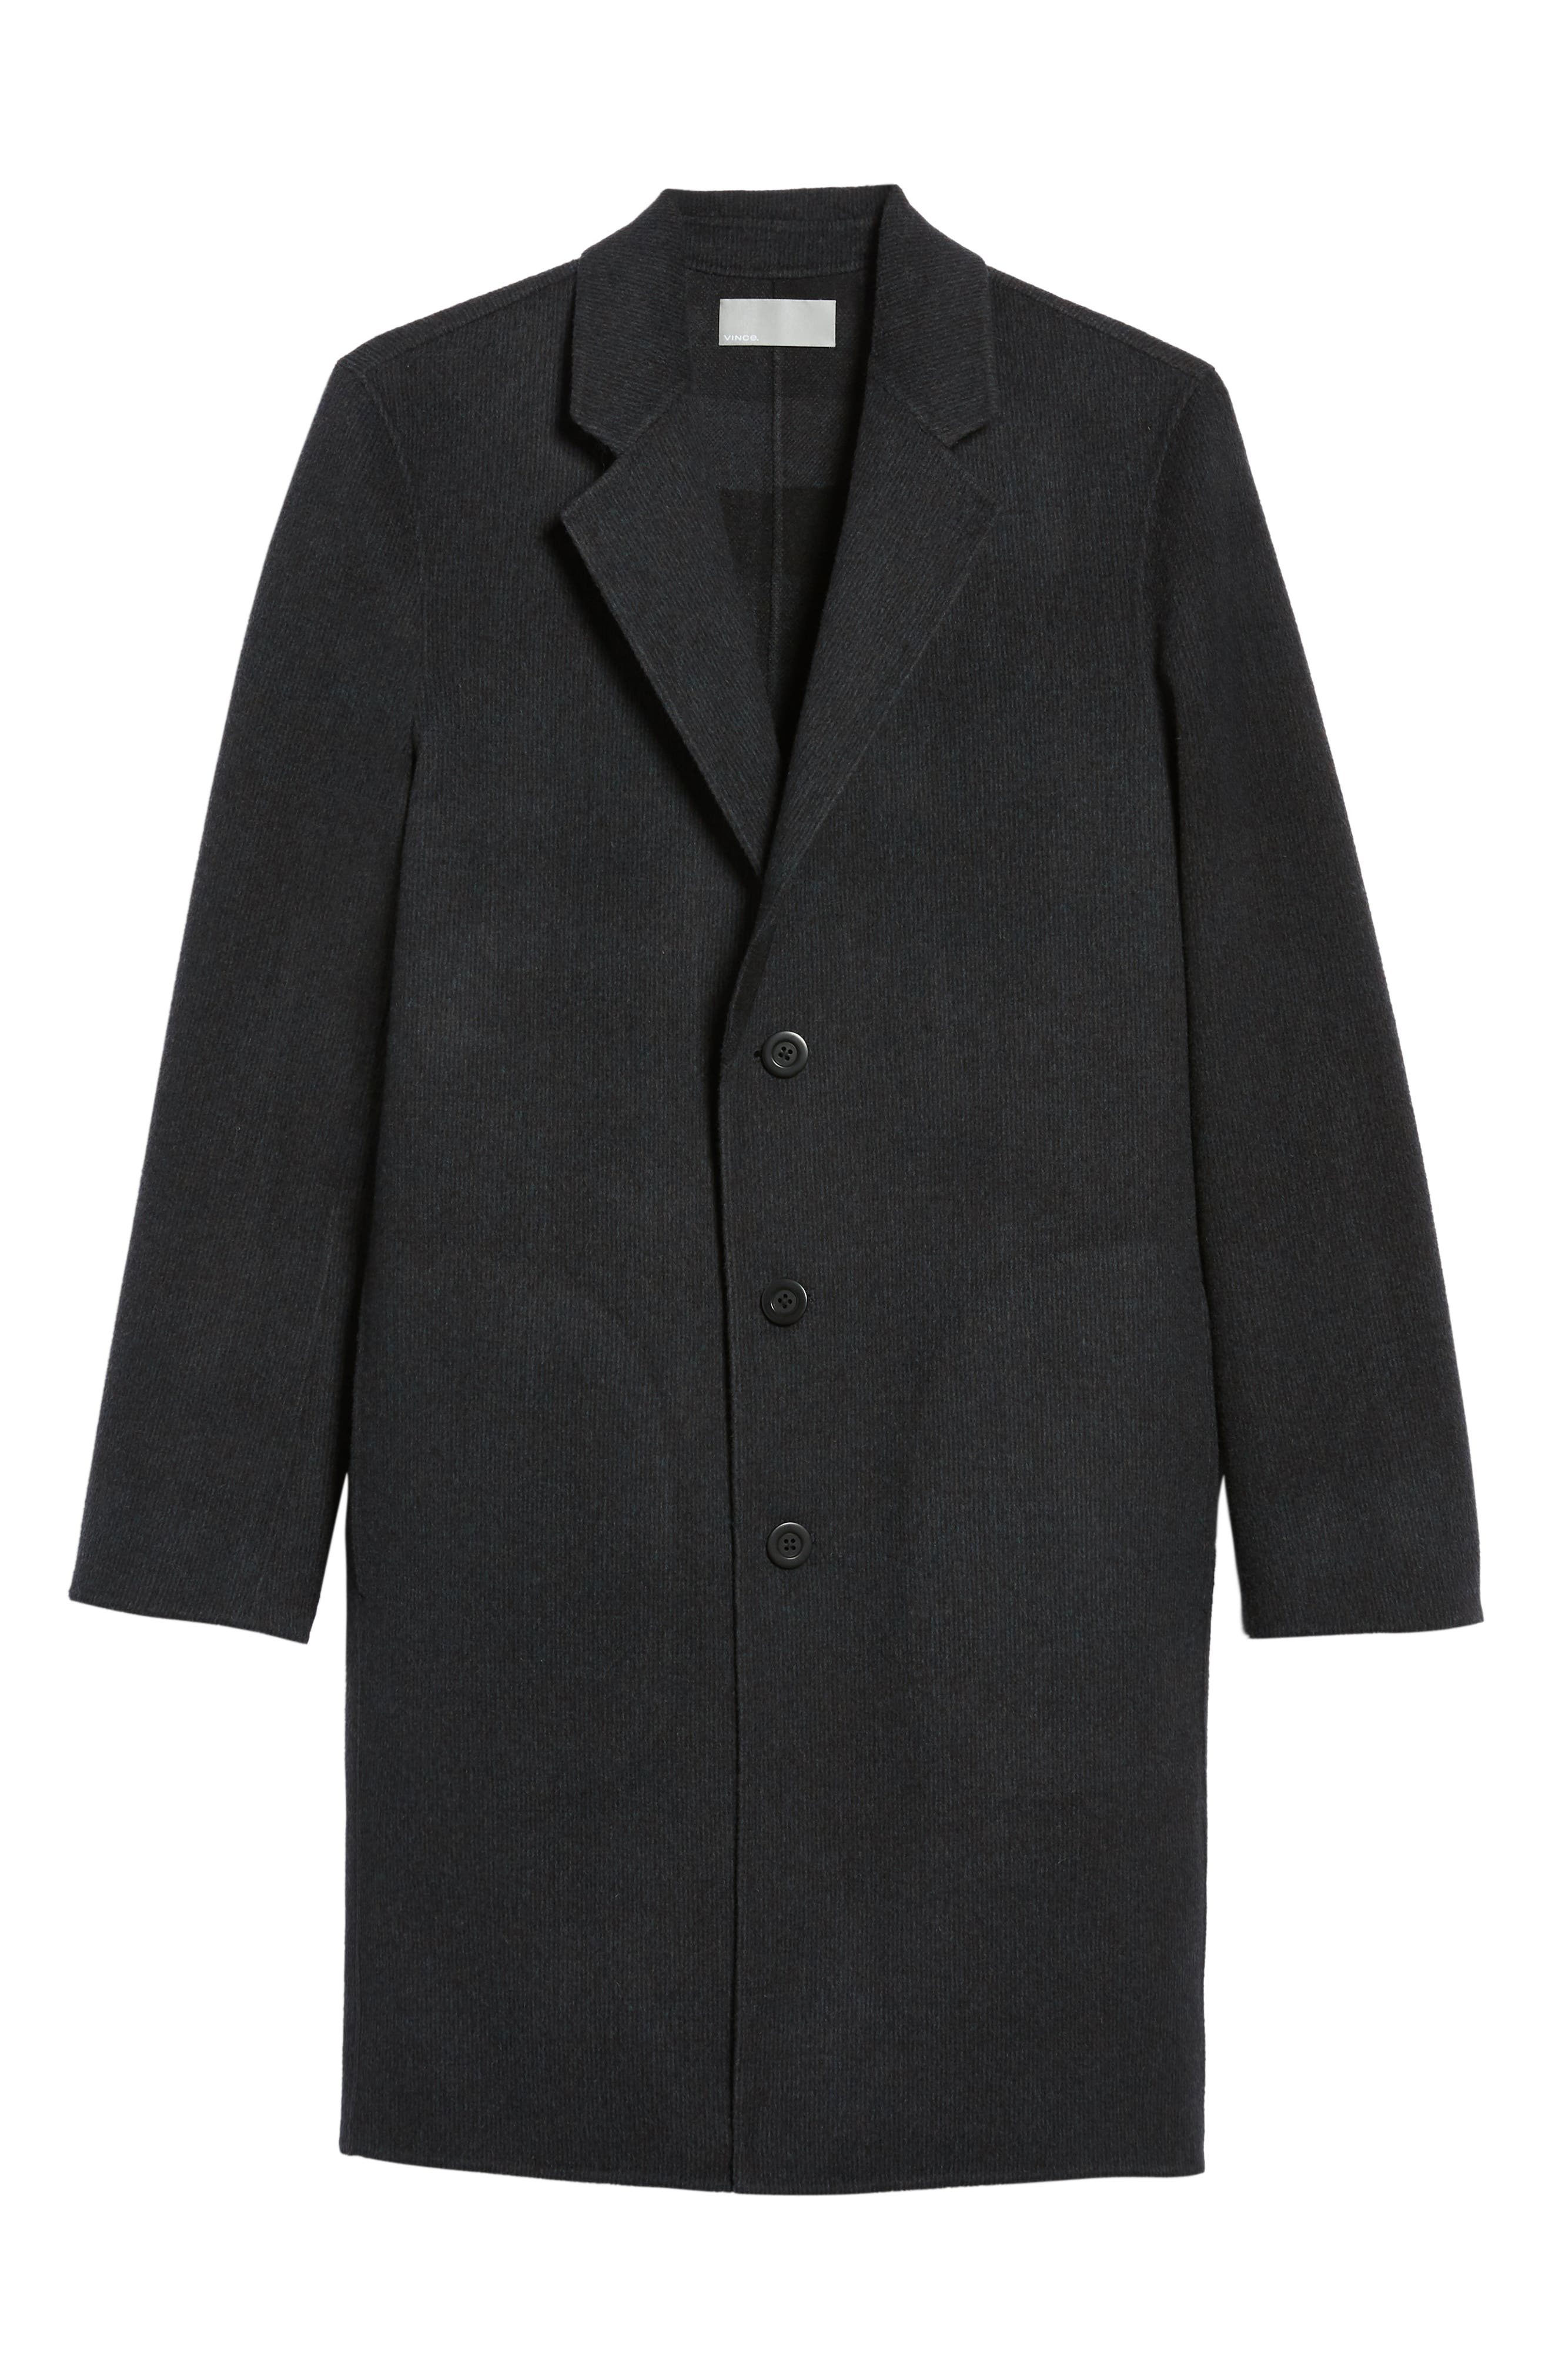 Wool Blend Car Coat,                             Alternate thumbnail 5, color,                             062